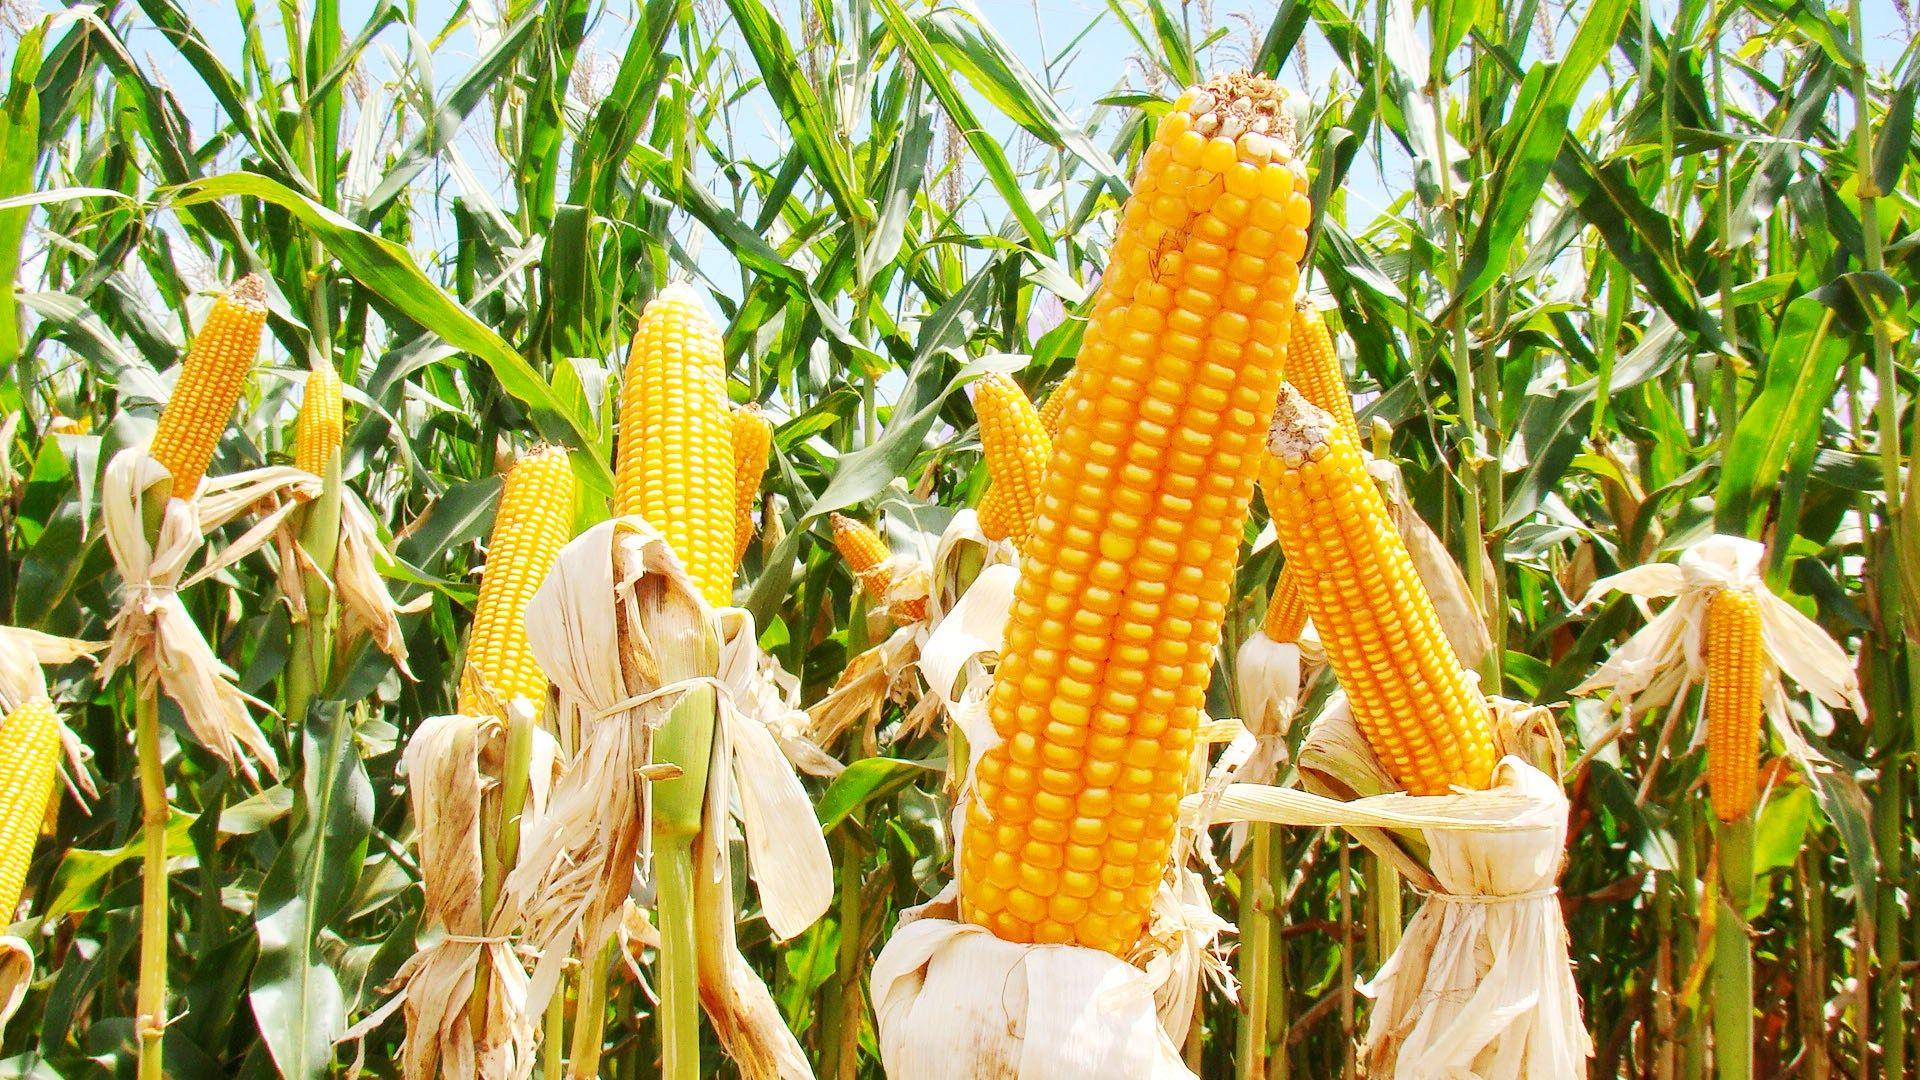 Corn wallpaper image hd